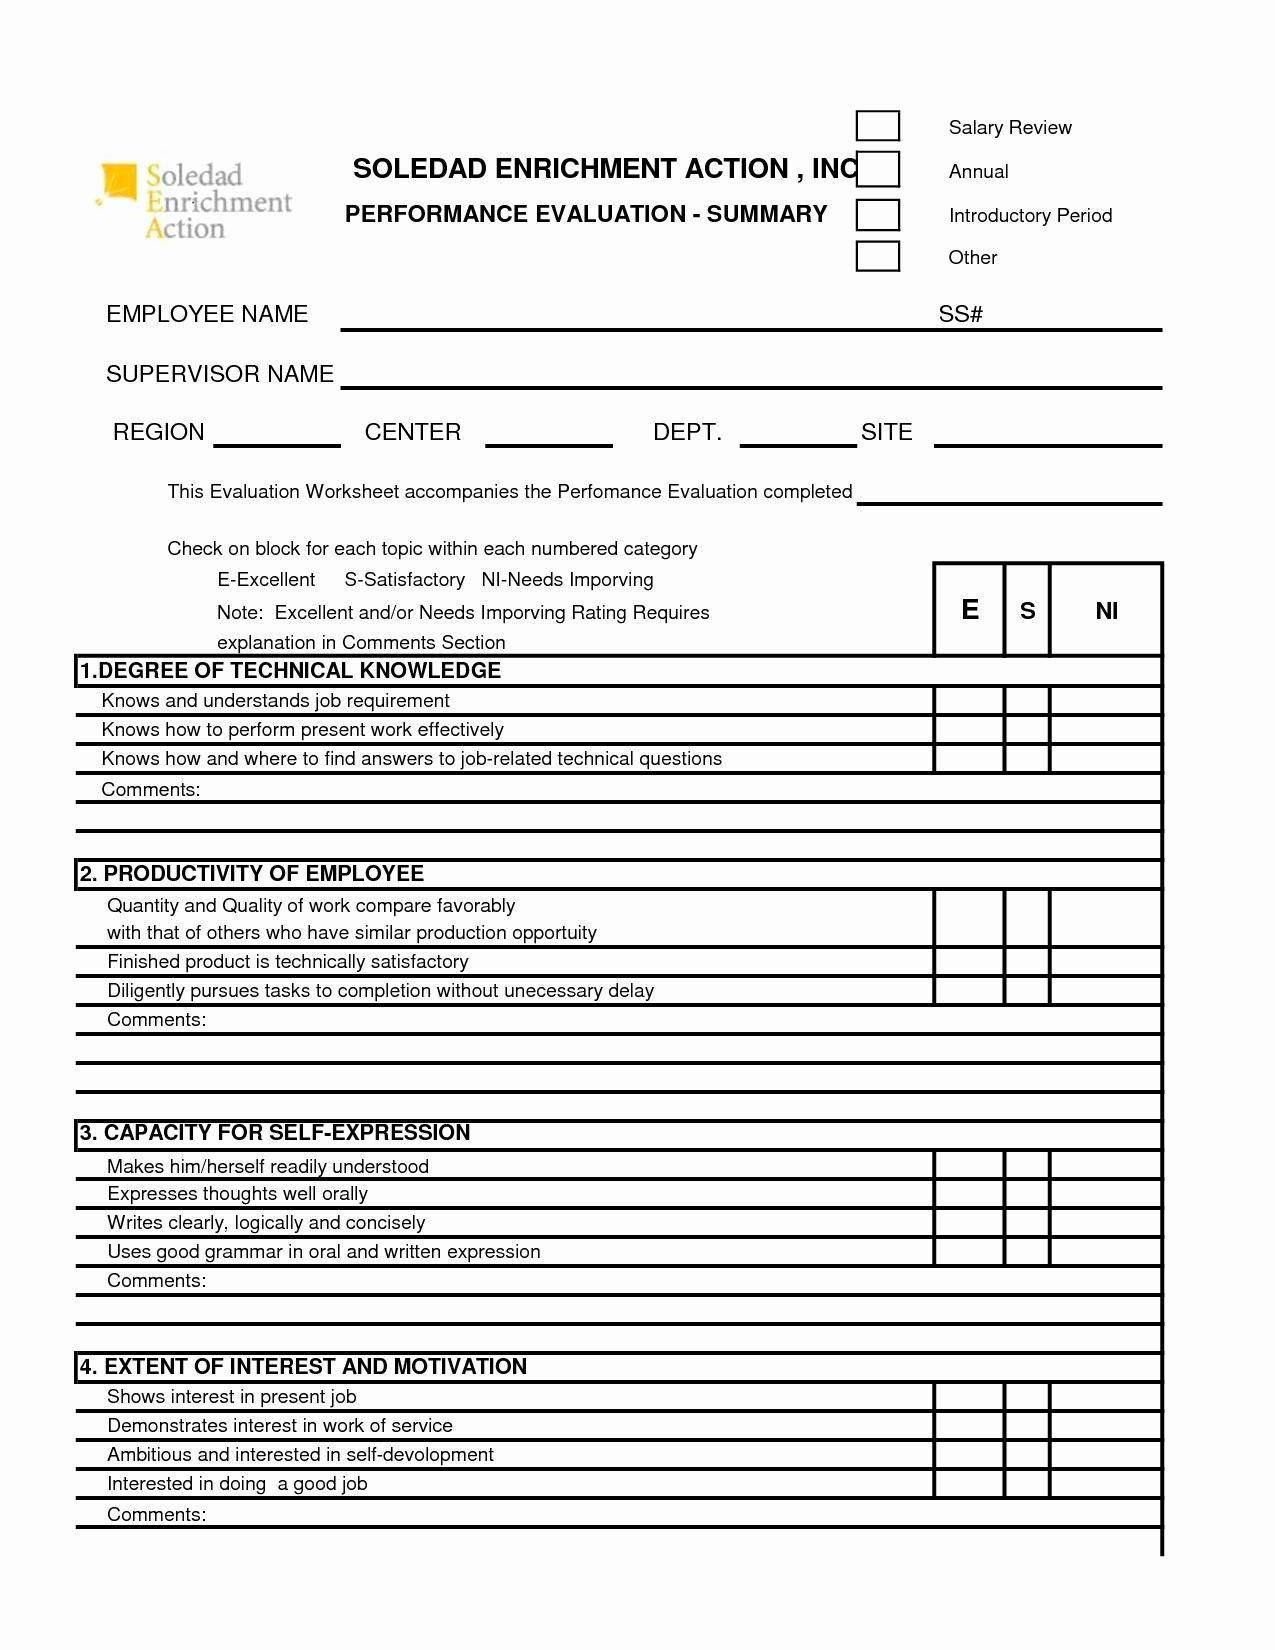 Employee Performance Appraisal form Template Beautiful Free 360 Performance Appraisal form Google Search